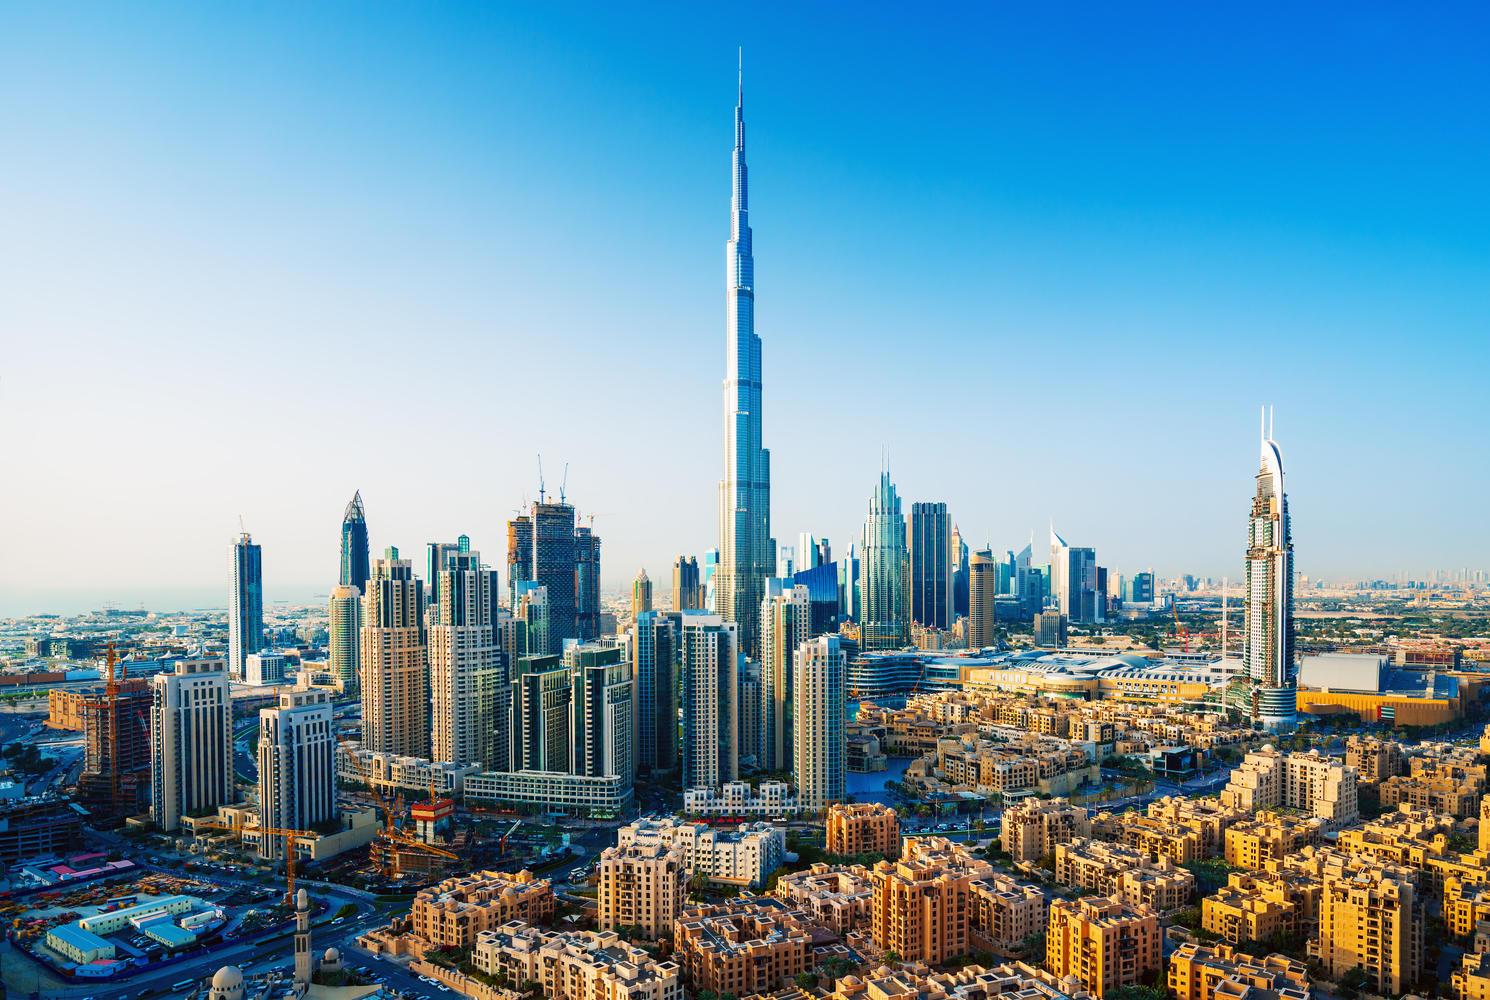 Дубай в Эмиратах